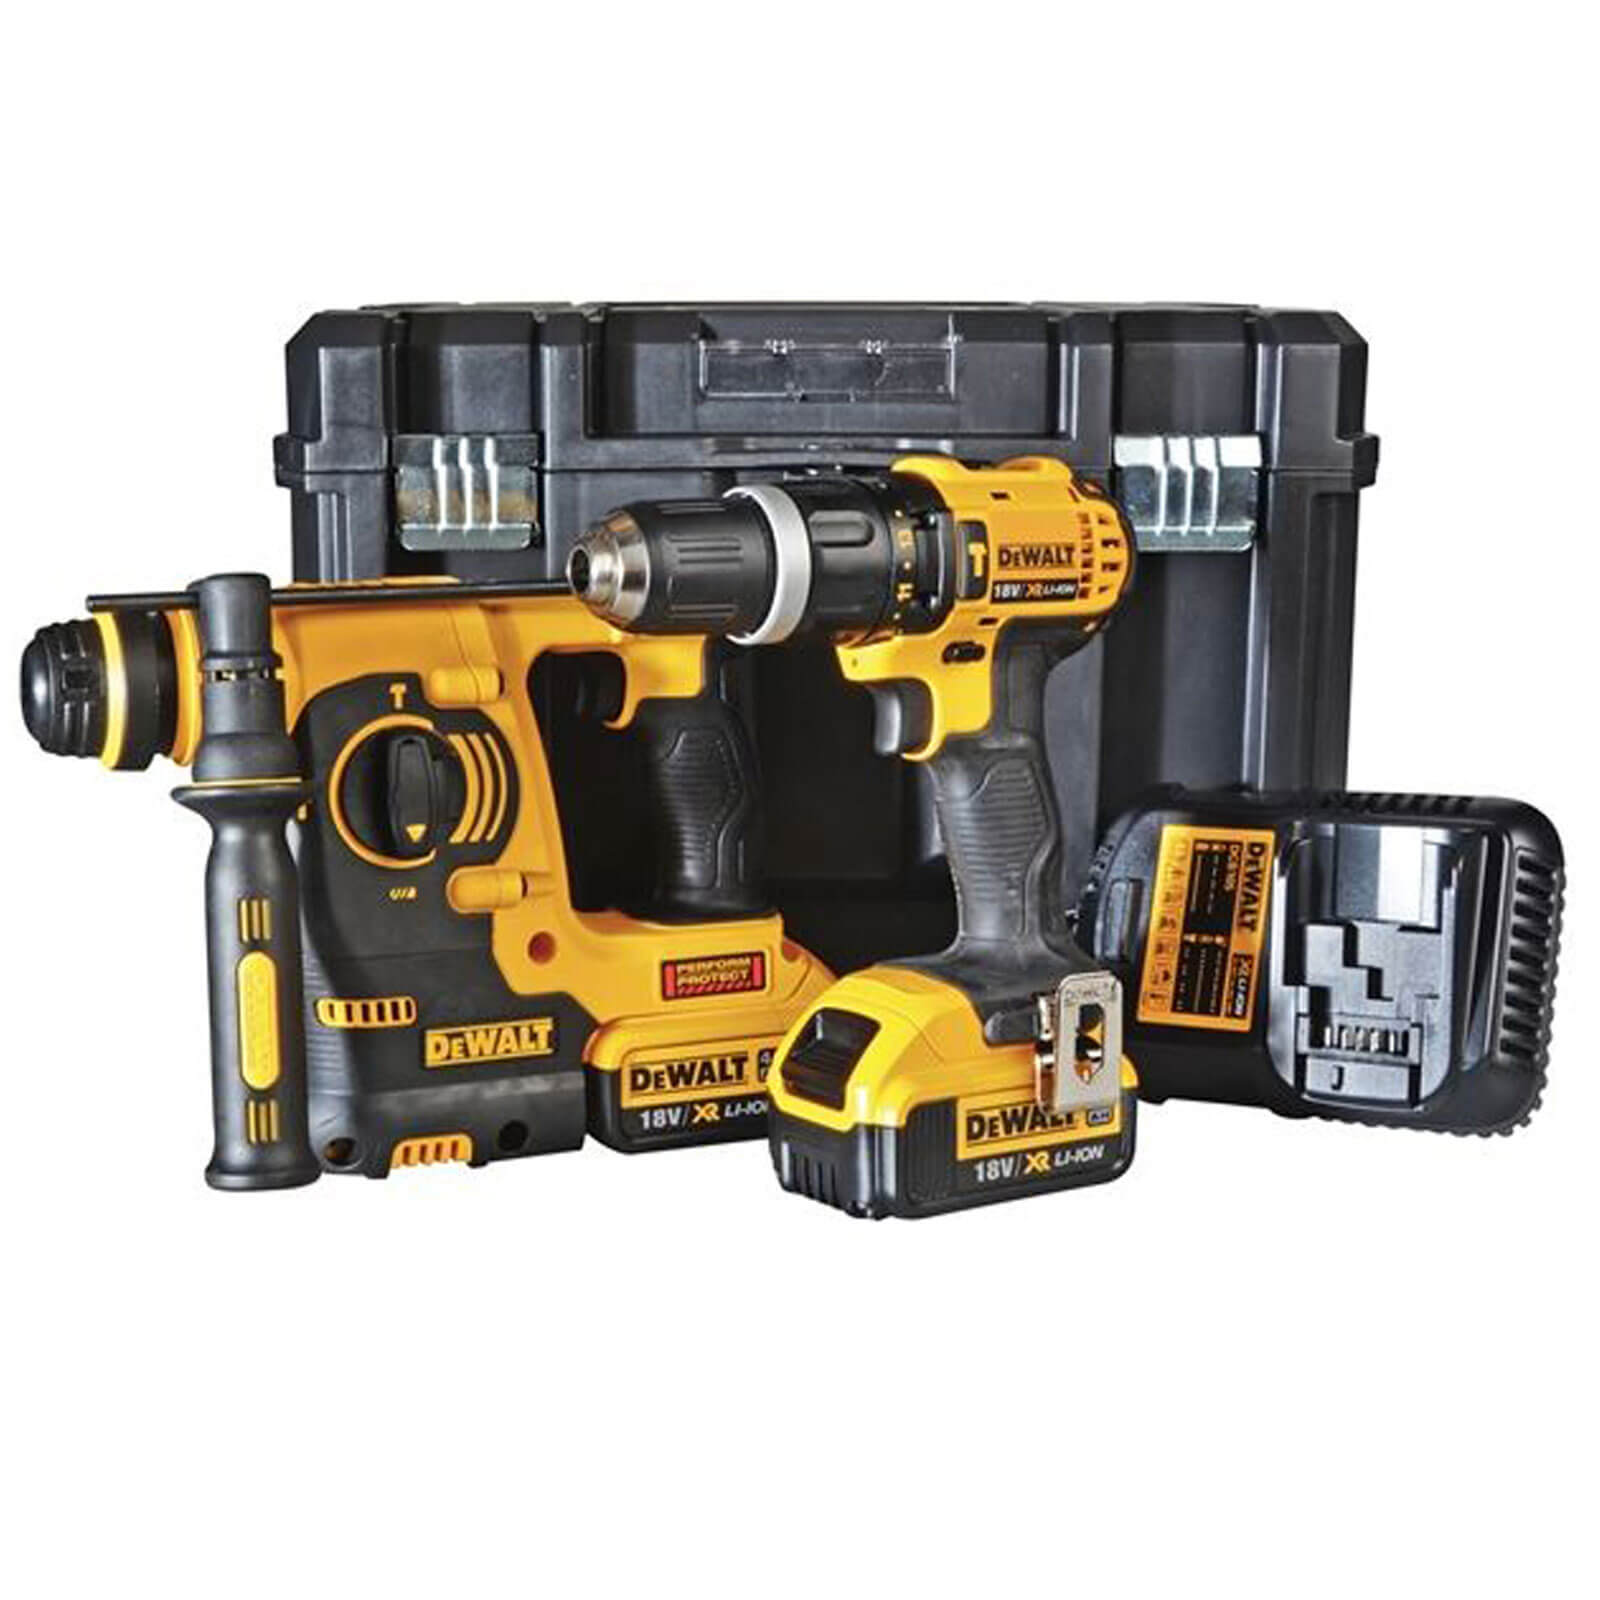 Dewalt DCK206M2 18v Cordless SDS Hammer Drill & Combi Drill Kit 2 x 4ah Liion Charger Case